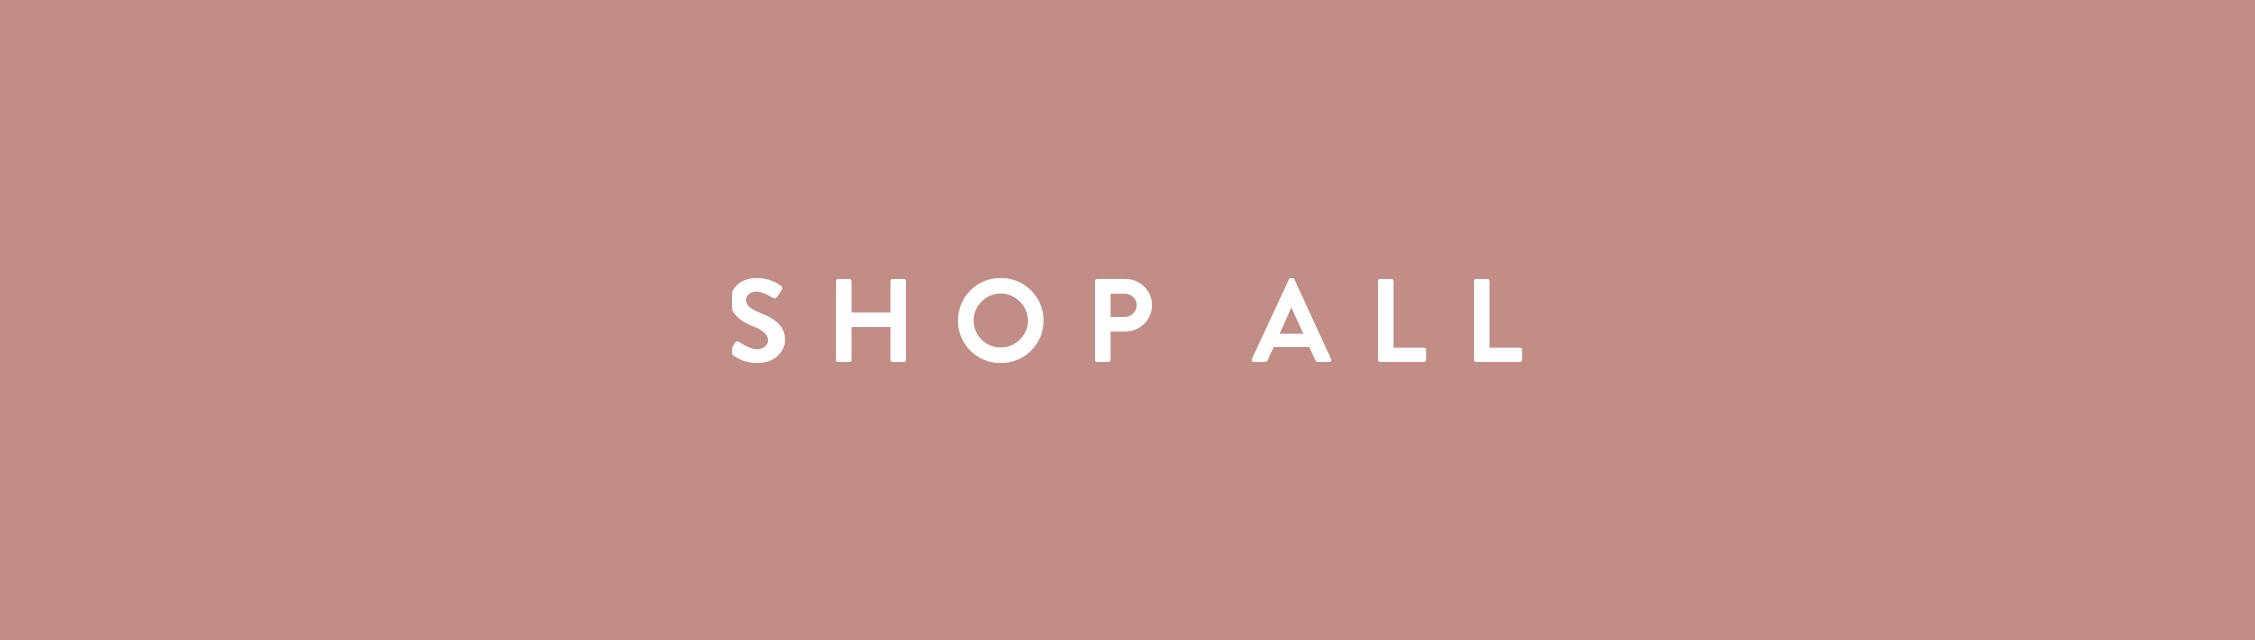 shop_all.jpg